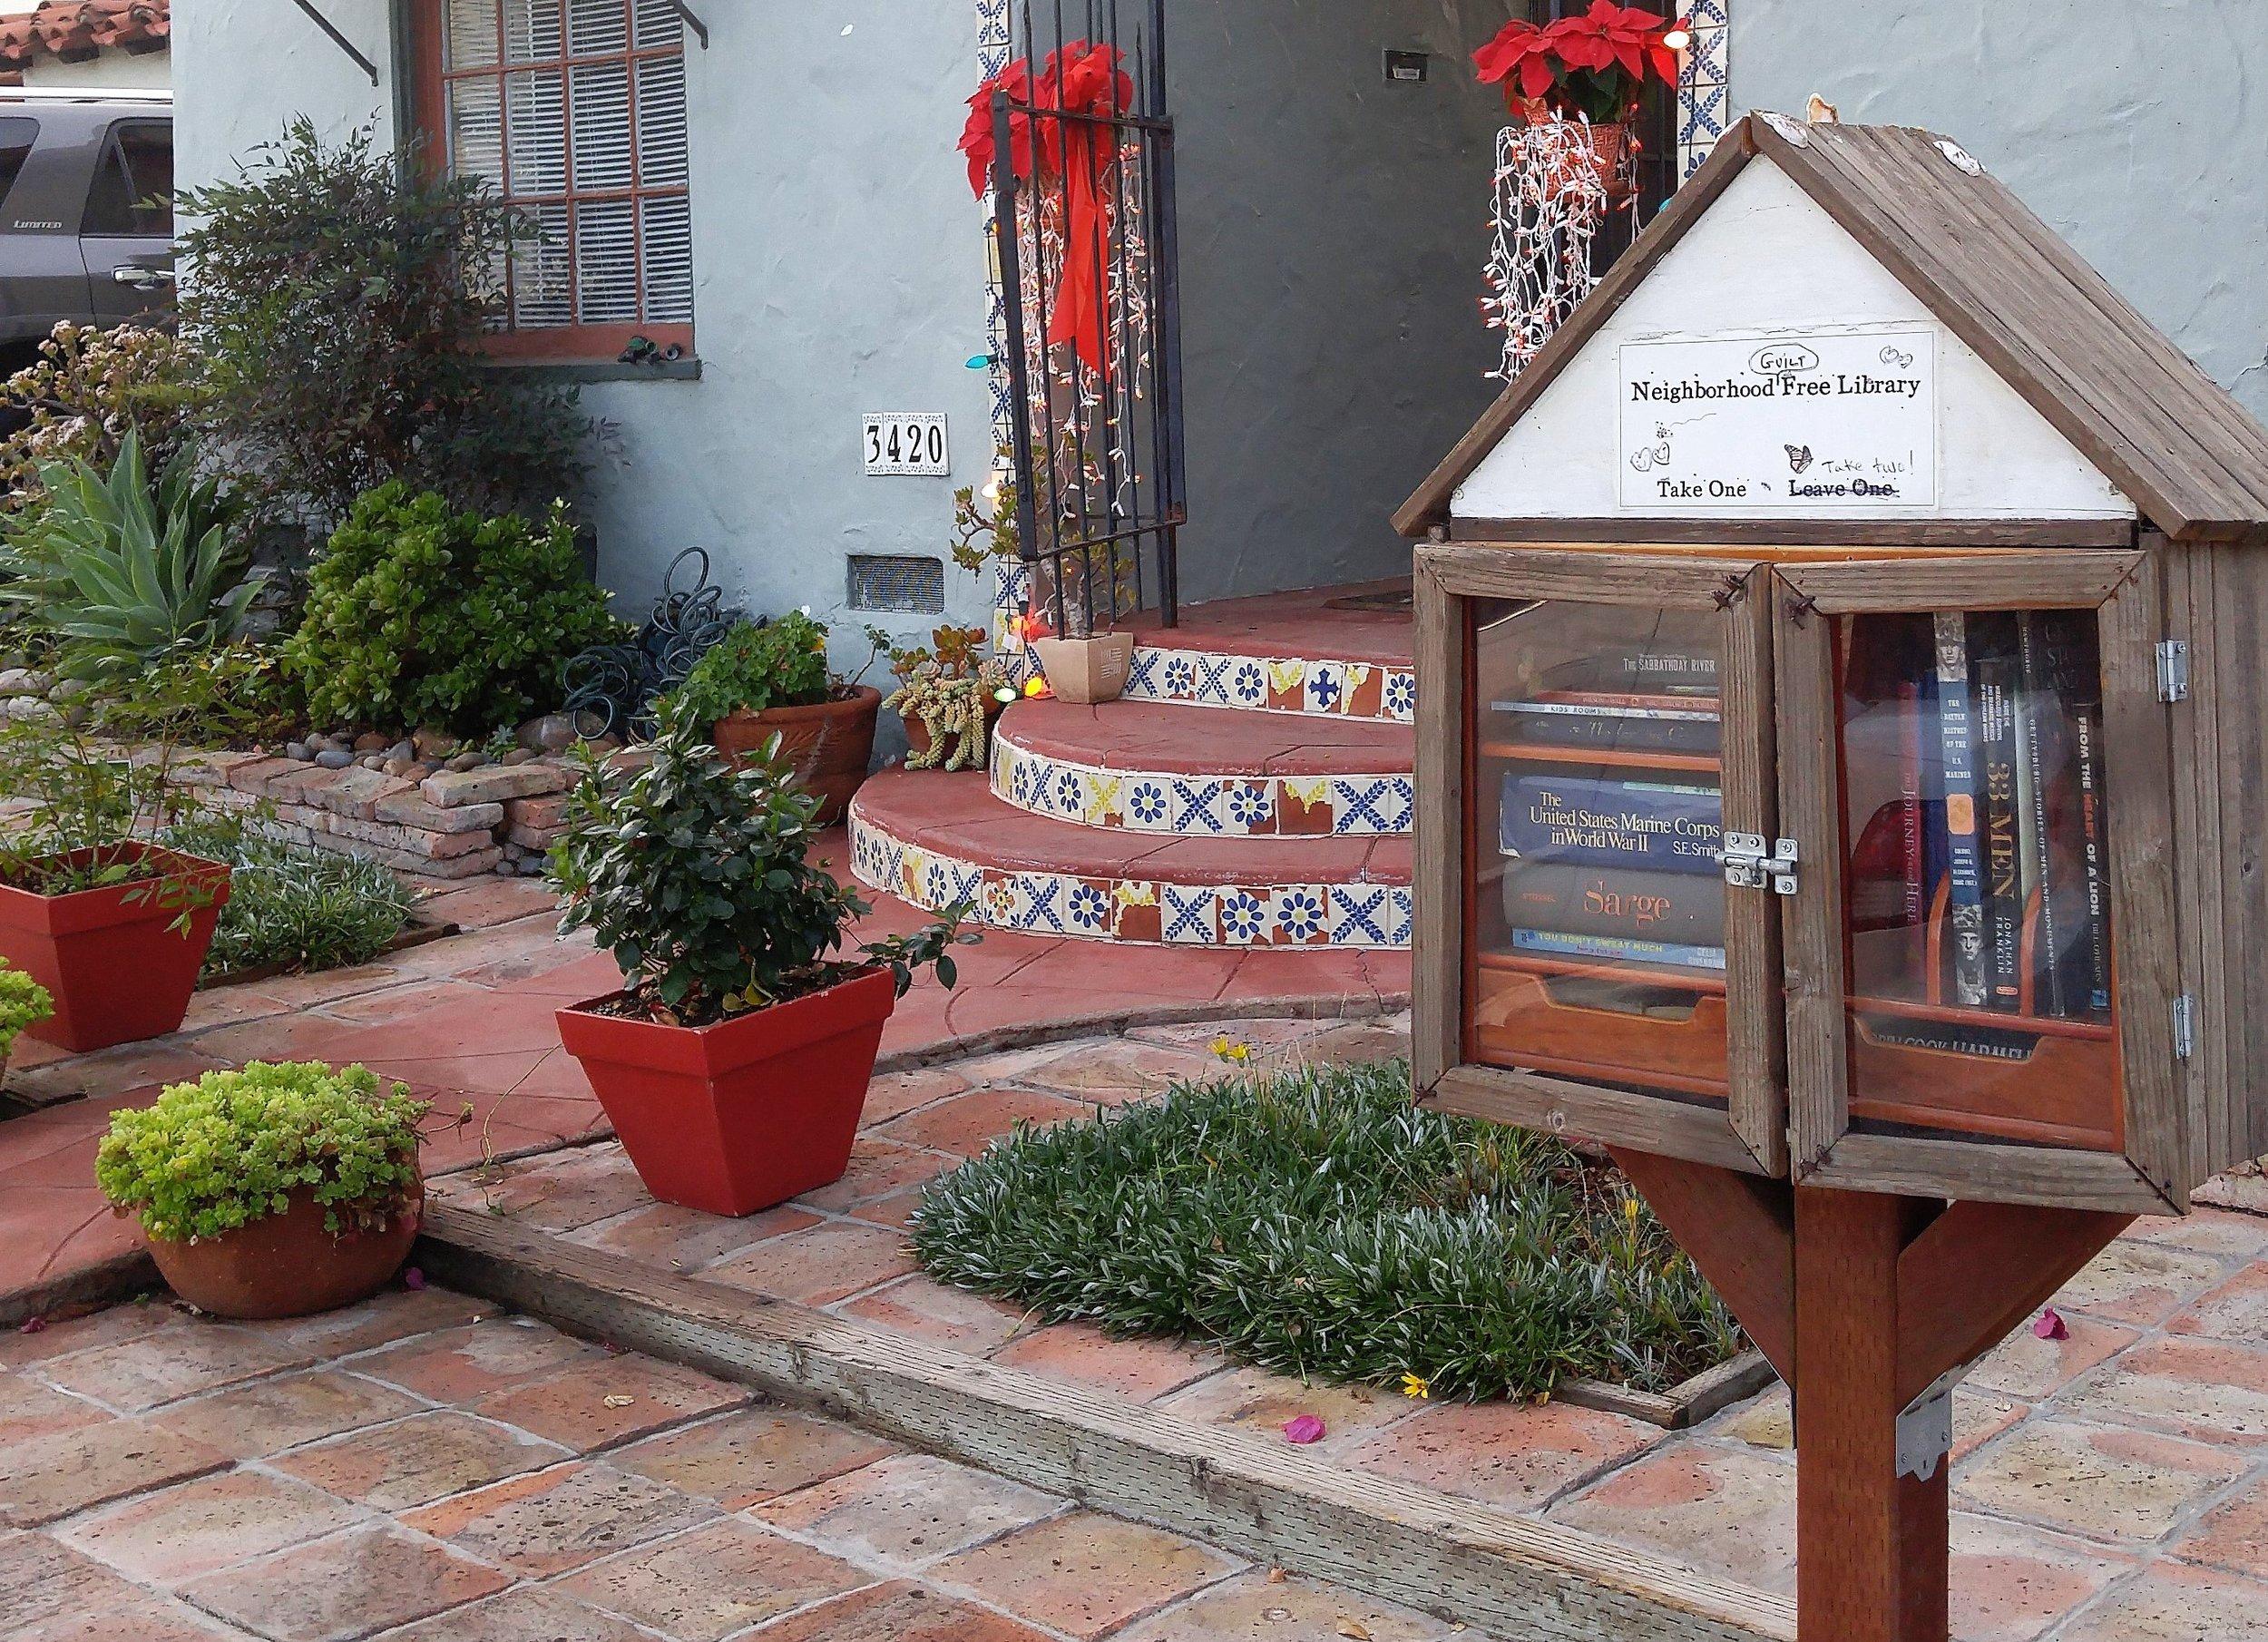 A Little Free Library in Monica Parks' neighborhood near Balboa Park